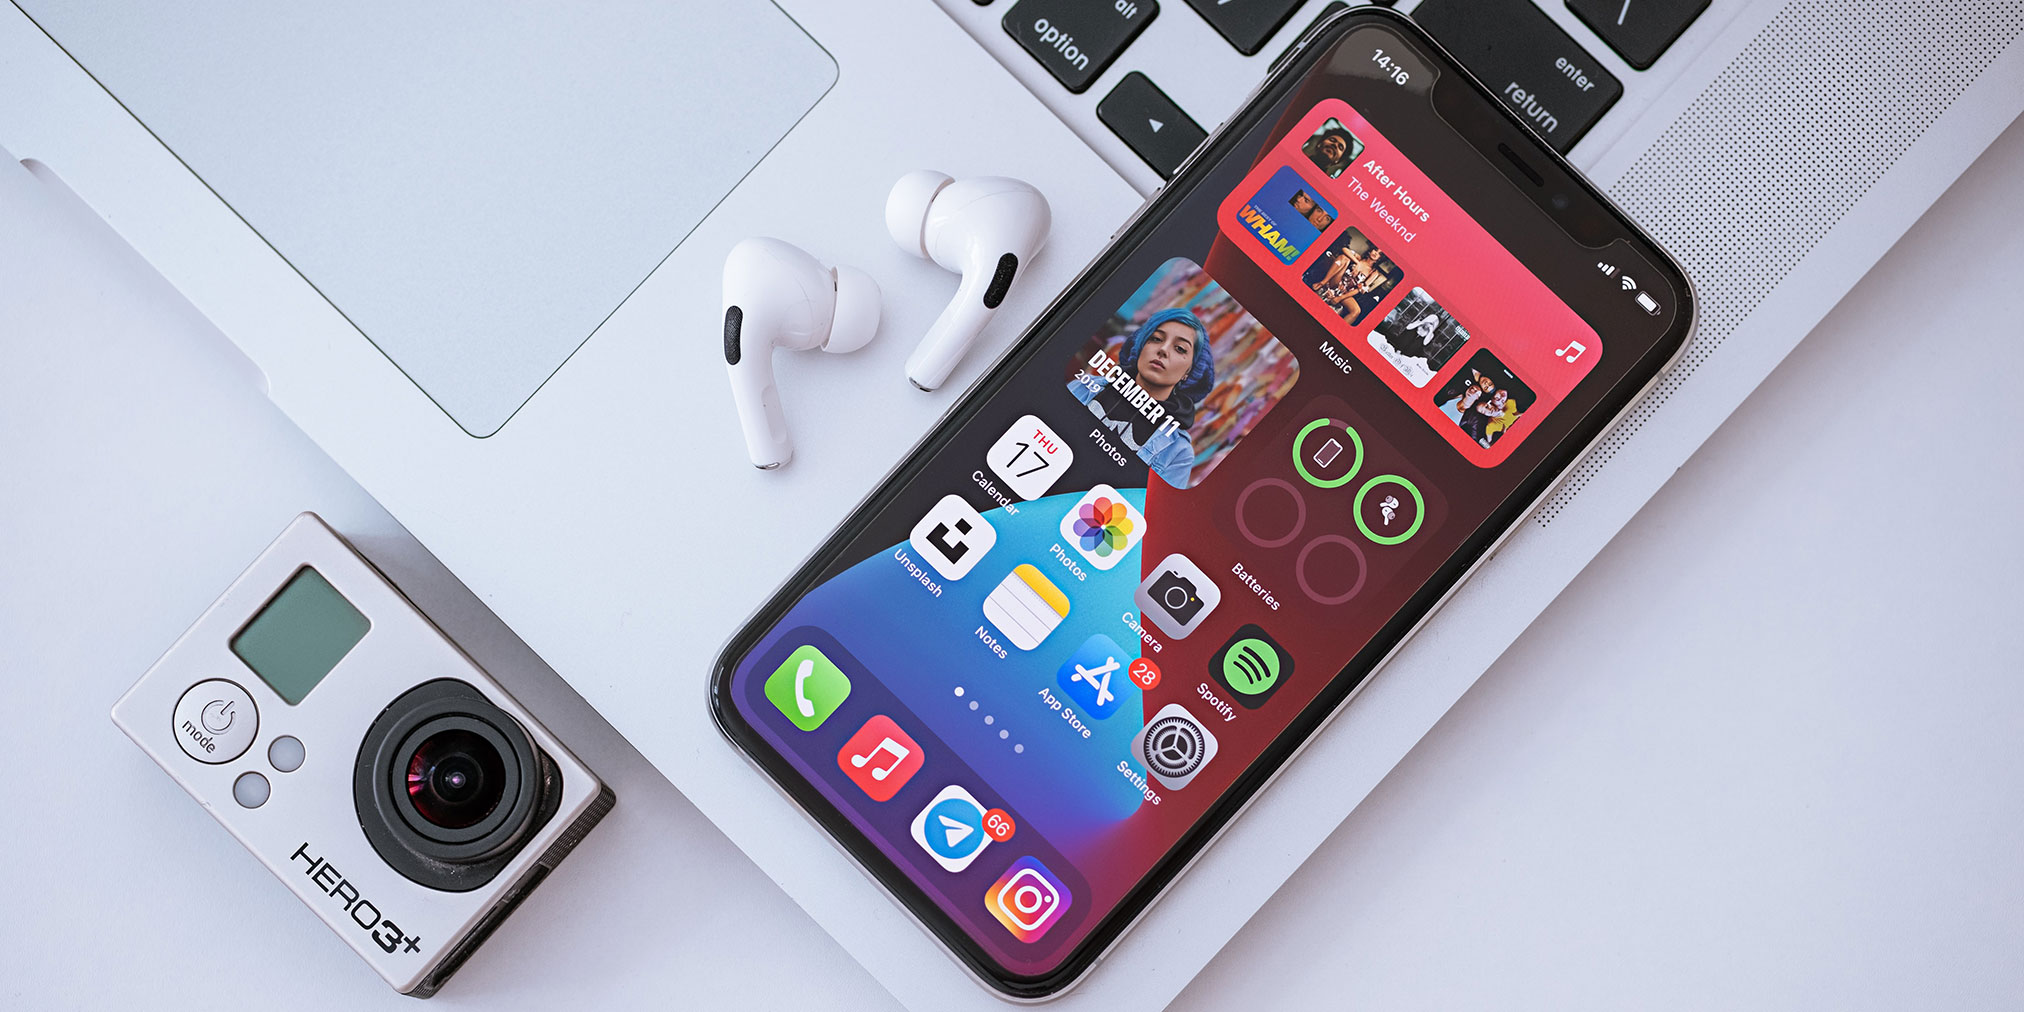 us iphones homescreen widget header sK1Xgj